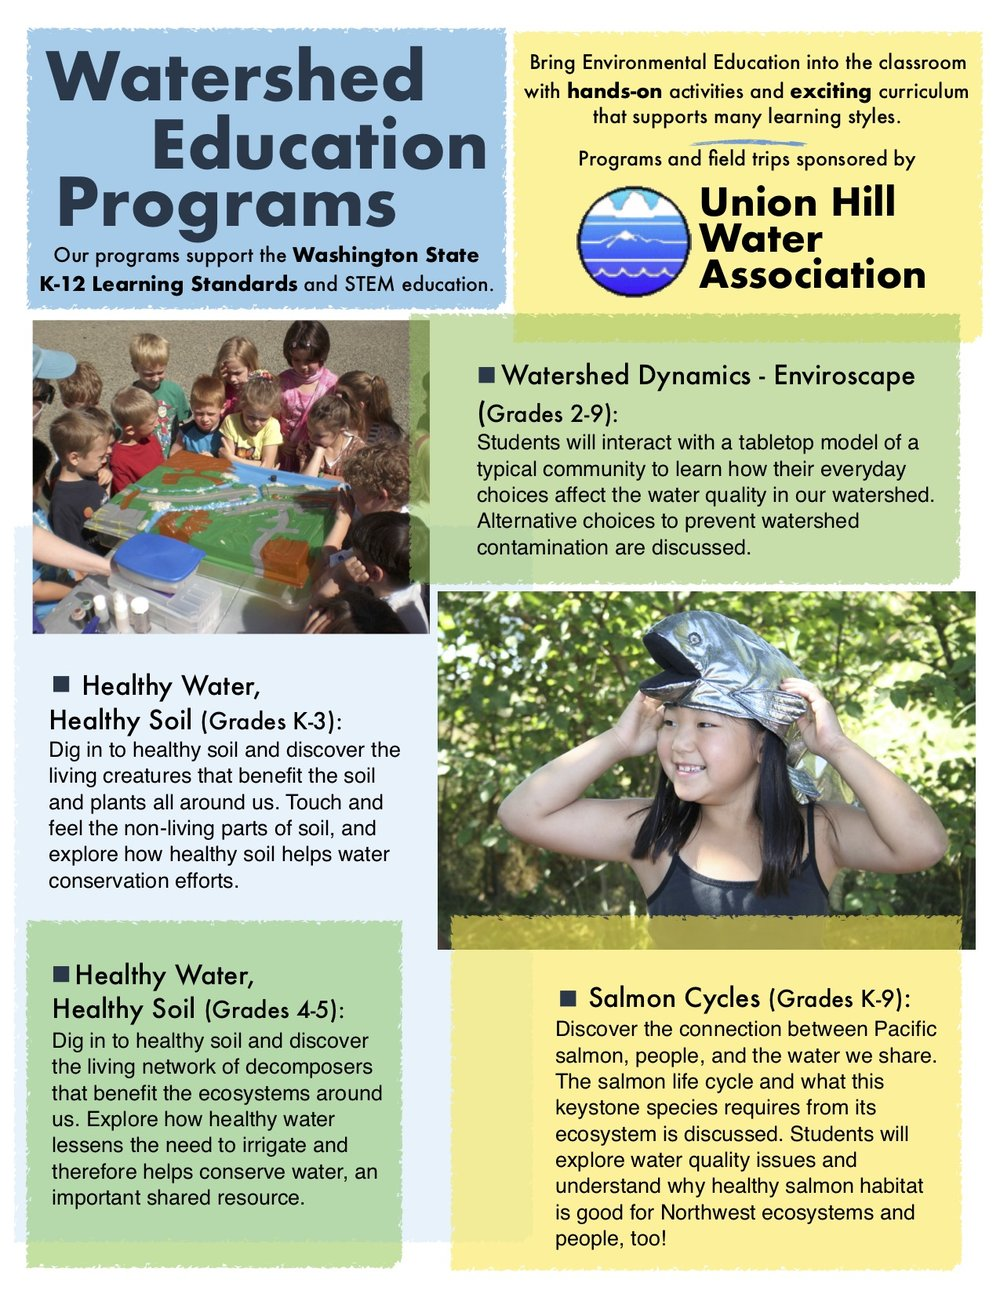 Union Hill Water Association - FULL